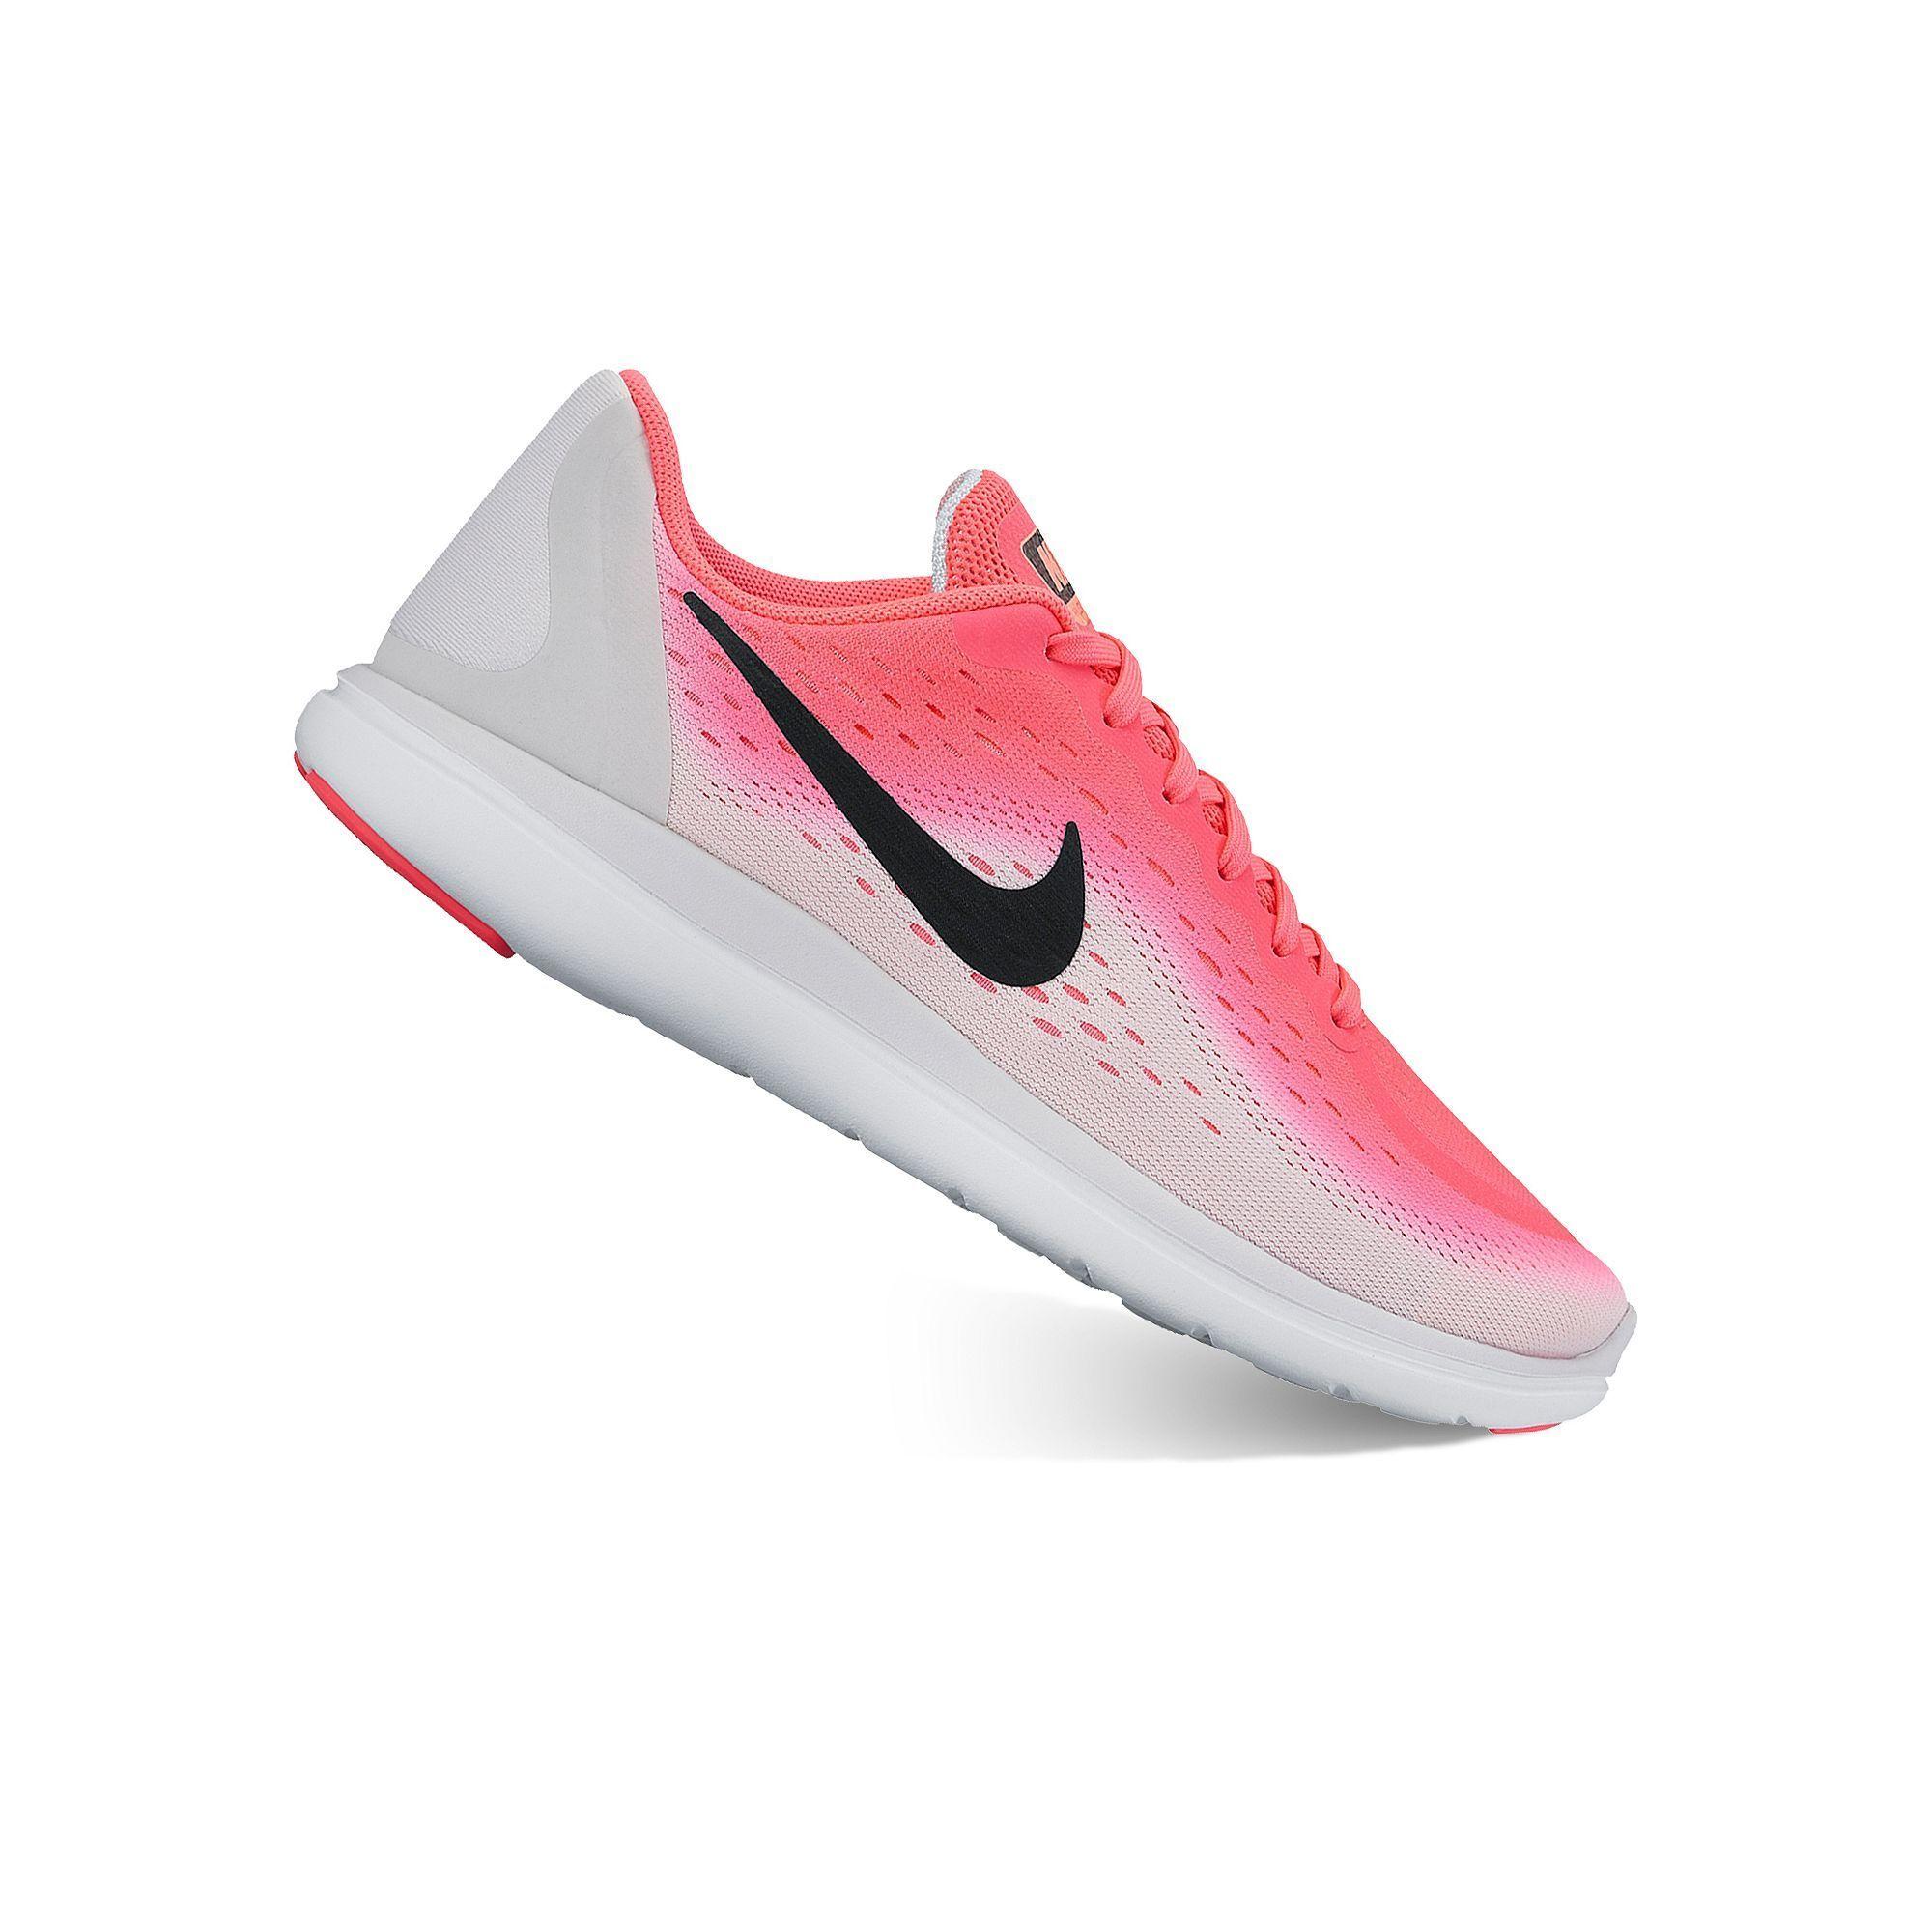 Girls sneakers, Nike flex run, Nike flex